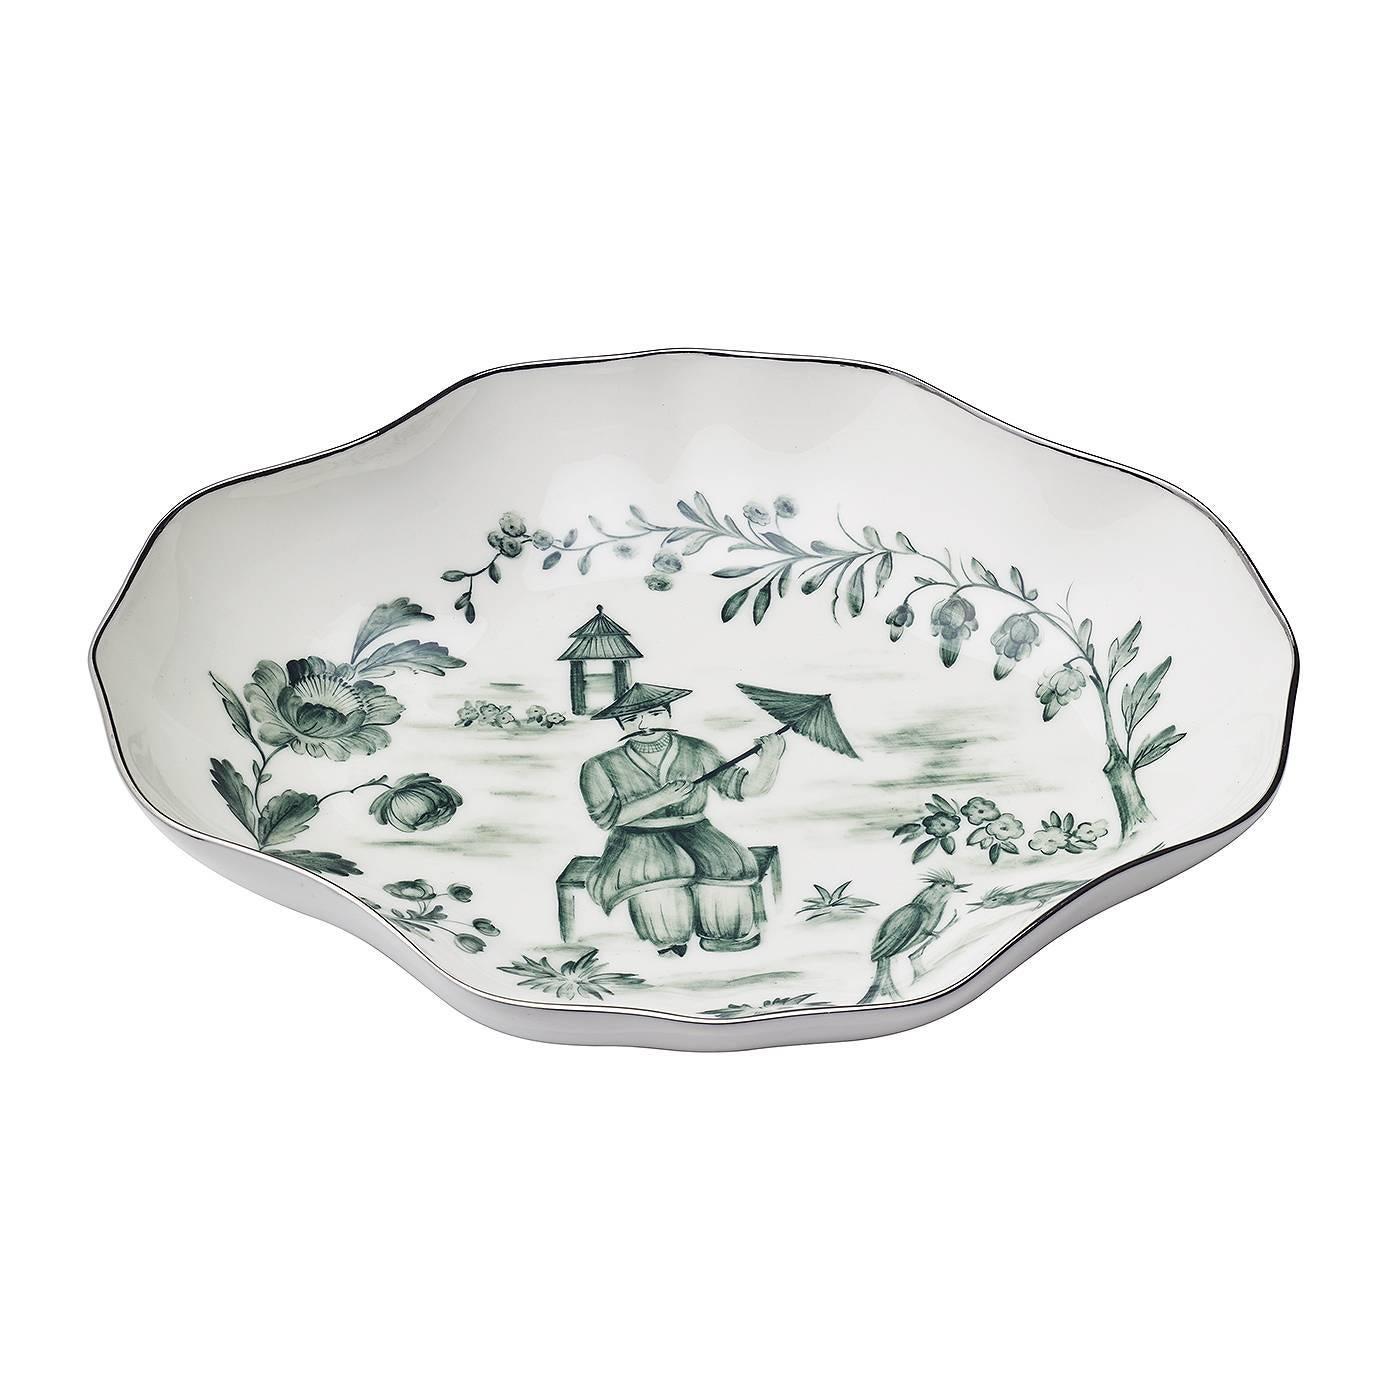 Handpainted Chinoiserie  Porcelain Pastry Dish Sofina Boutique Kitzbühel